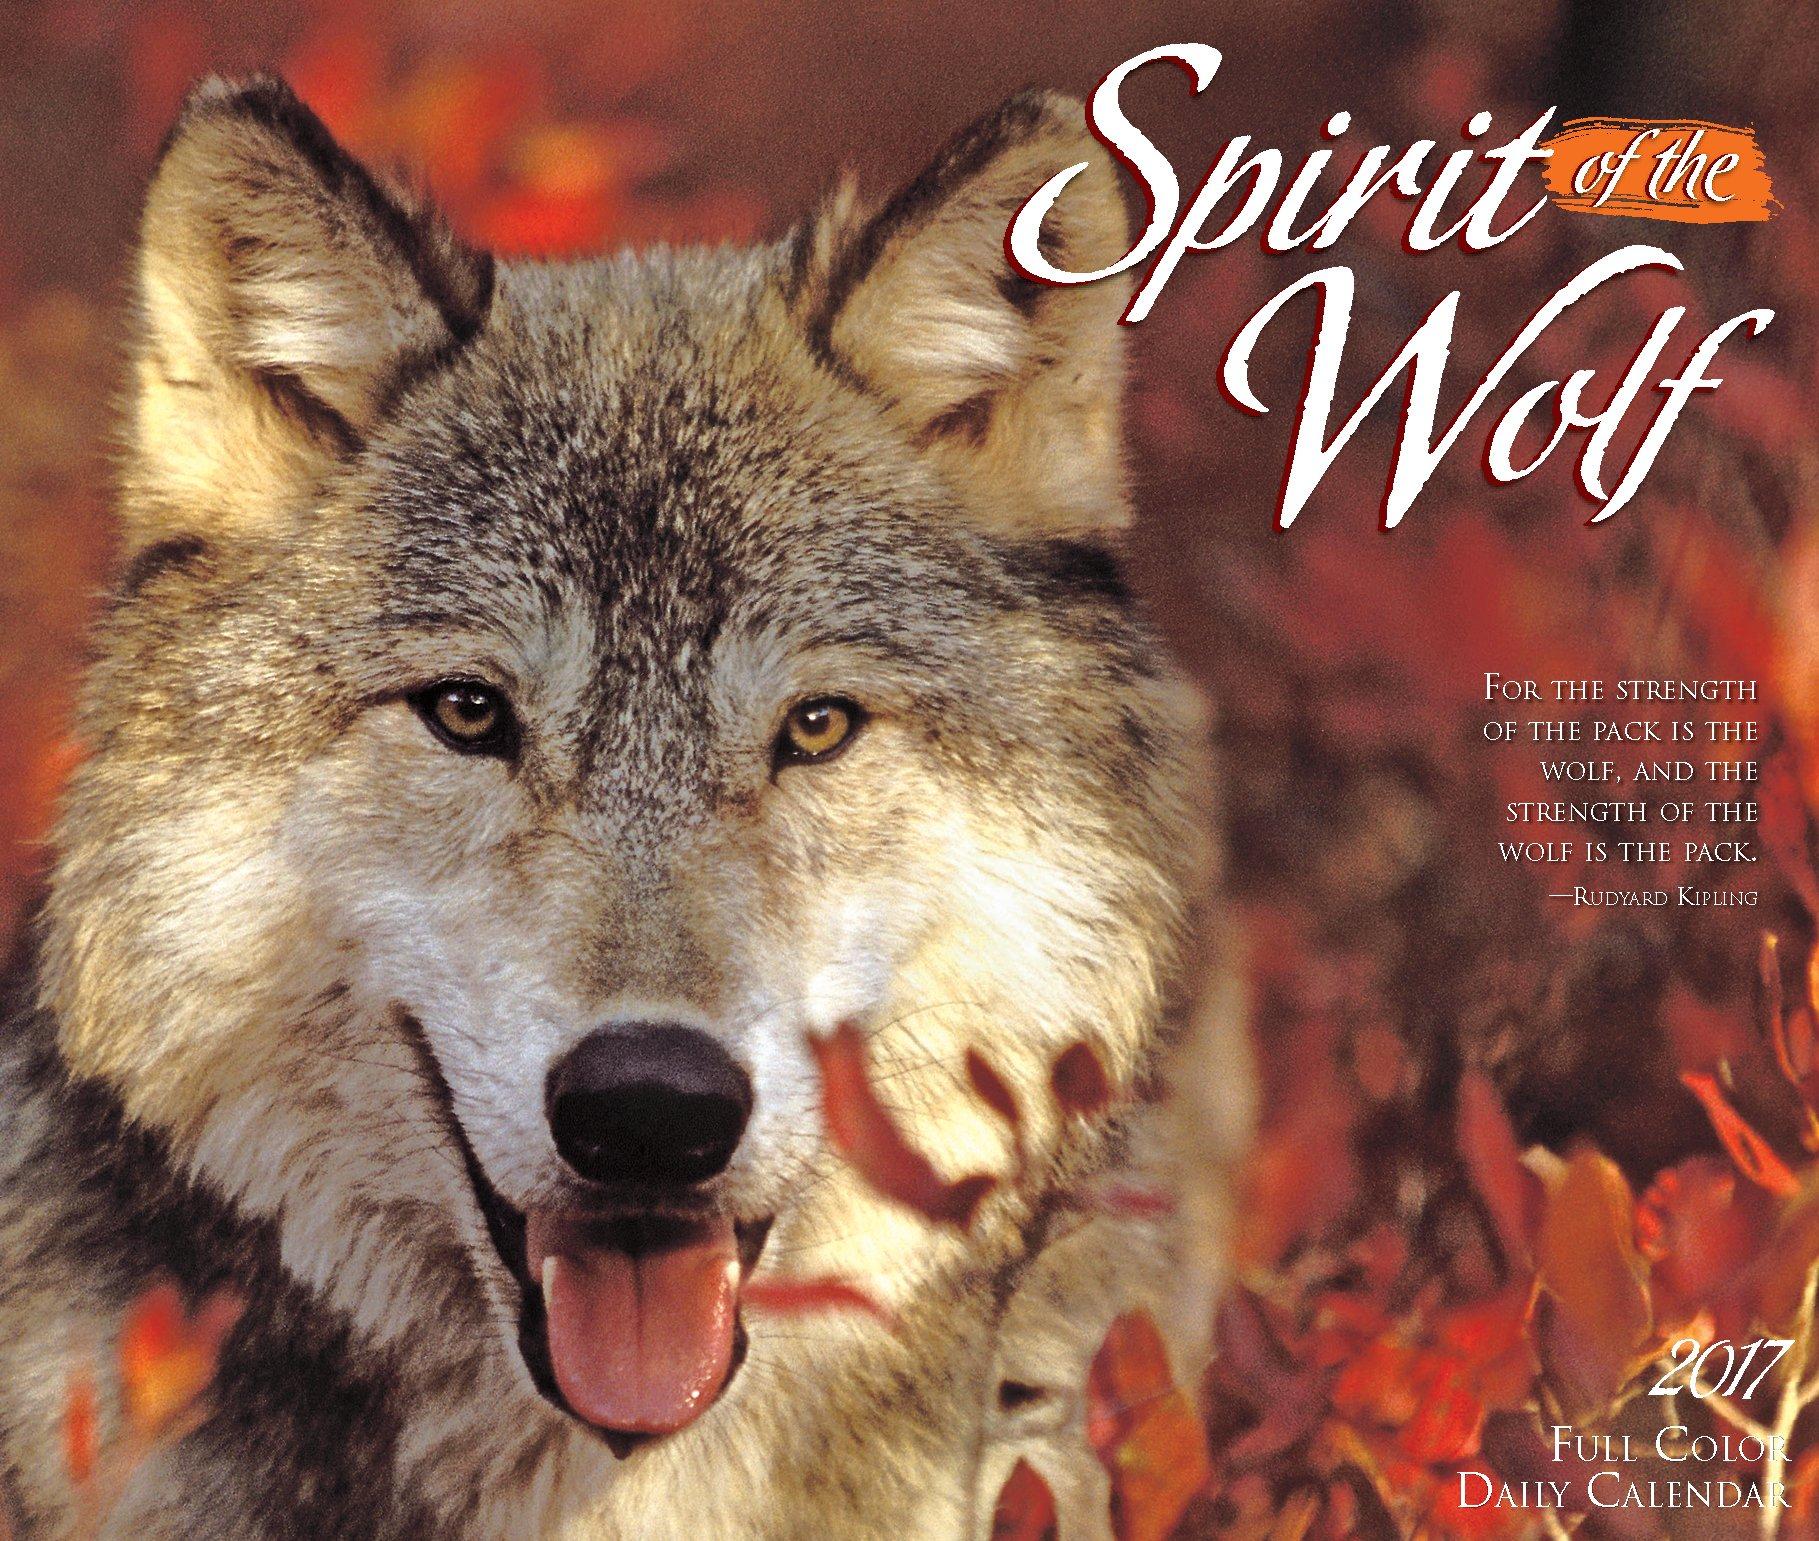 Download Spirit of the Wolf 2017 Box Calendar ebook